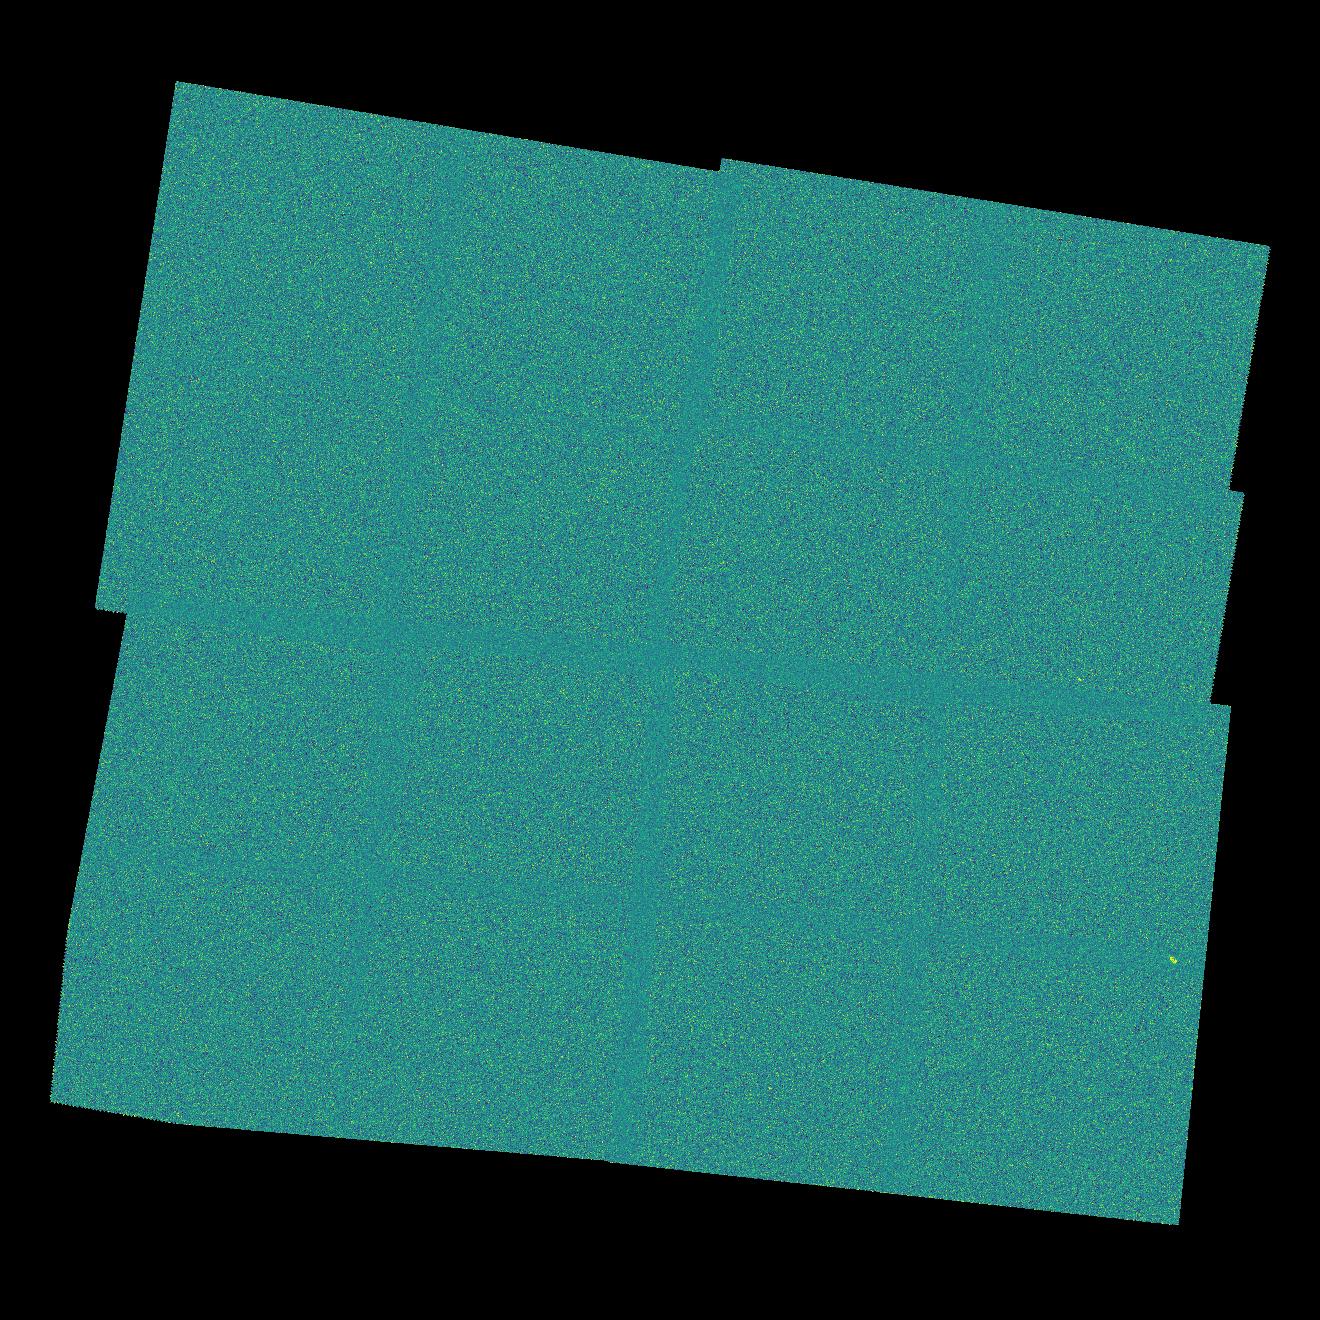 1567214299906-Herschel_PACS_North_Galactic_Pole_1320w.jpg